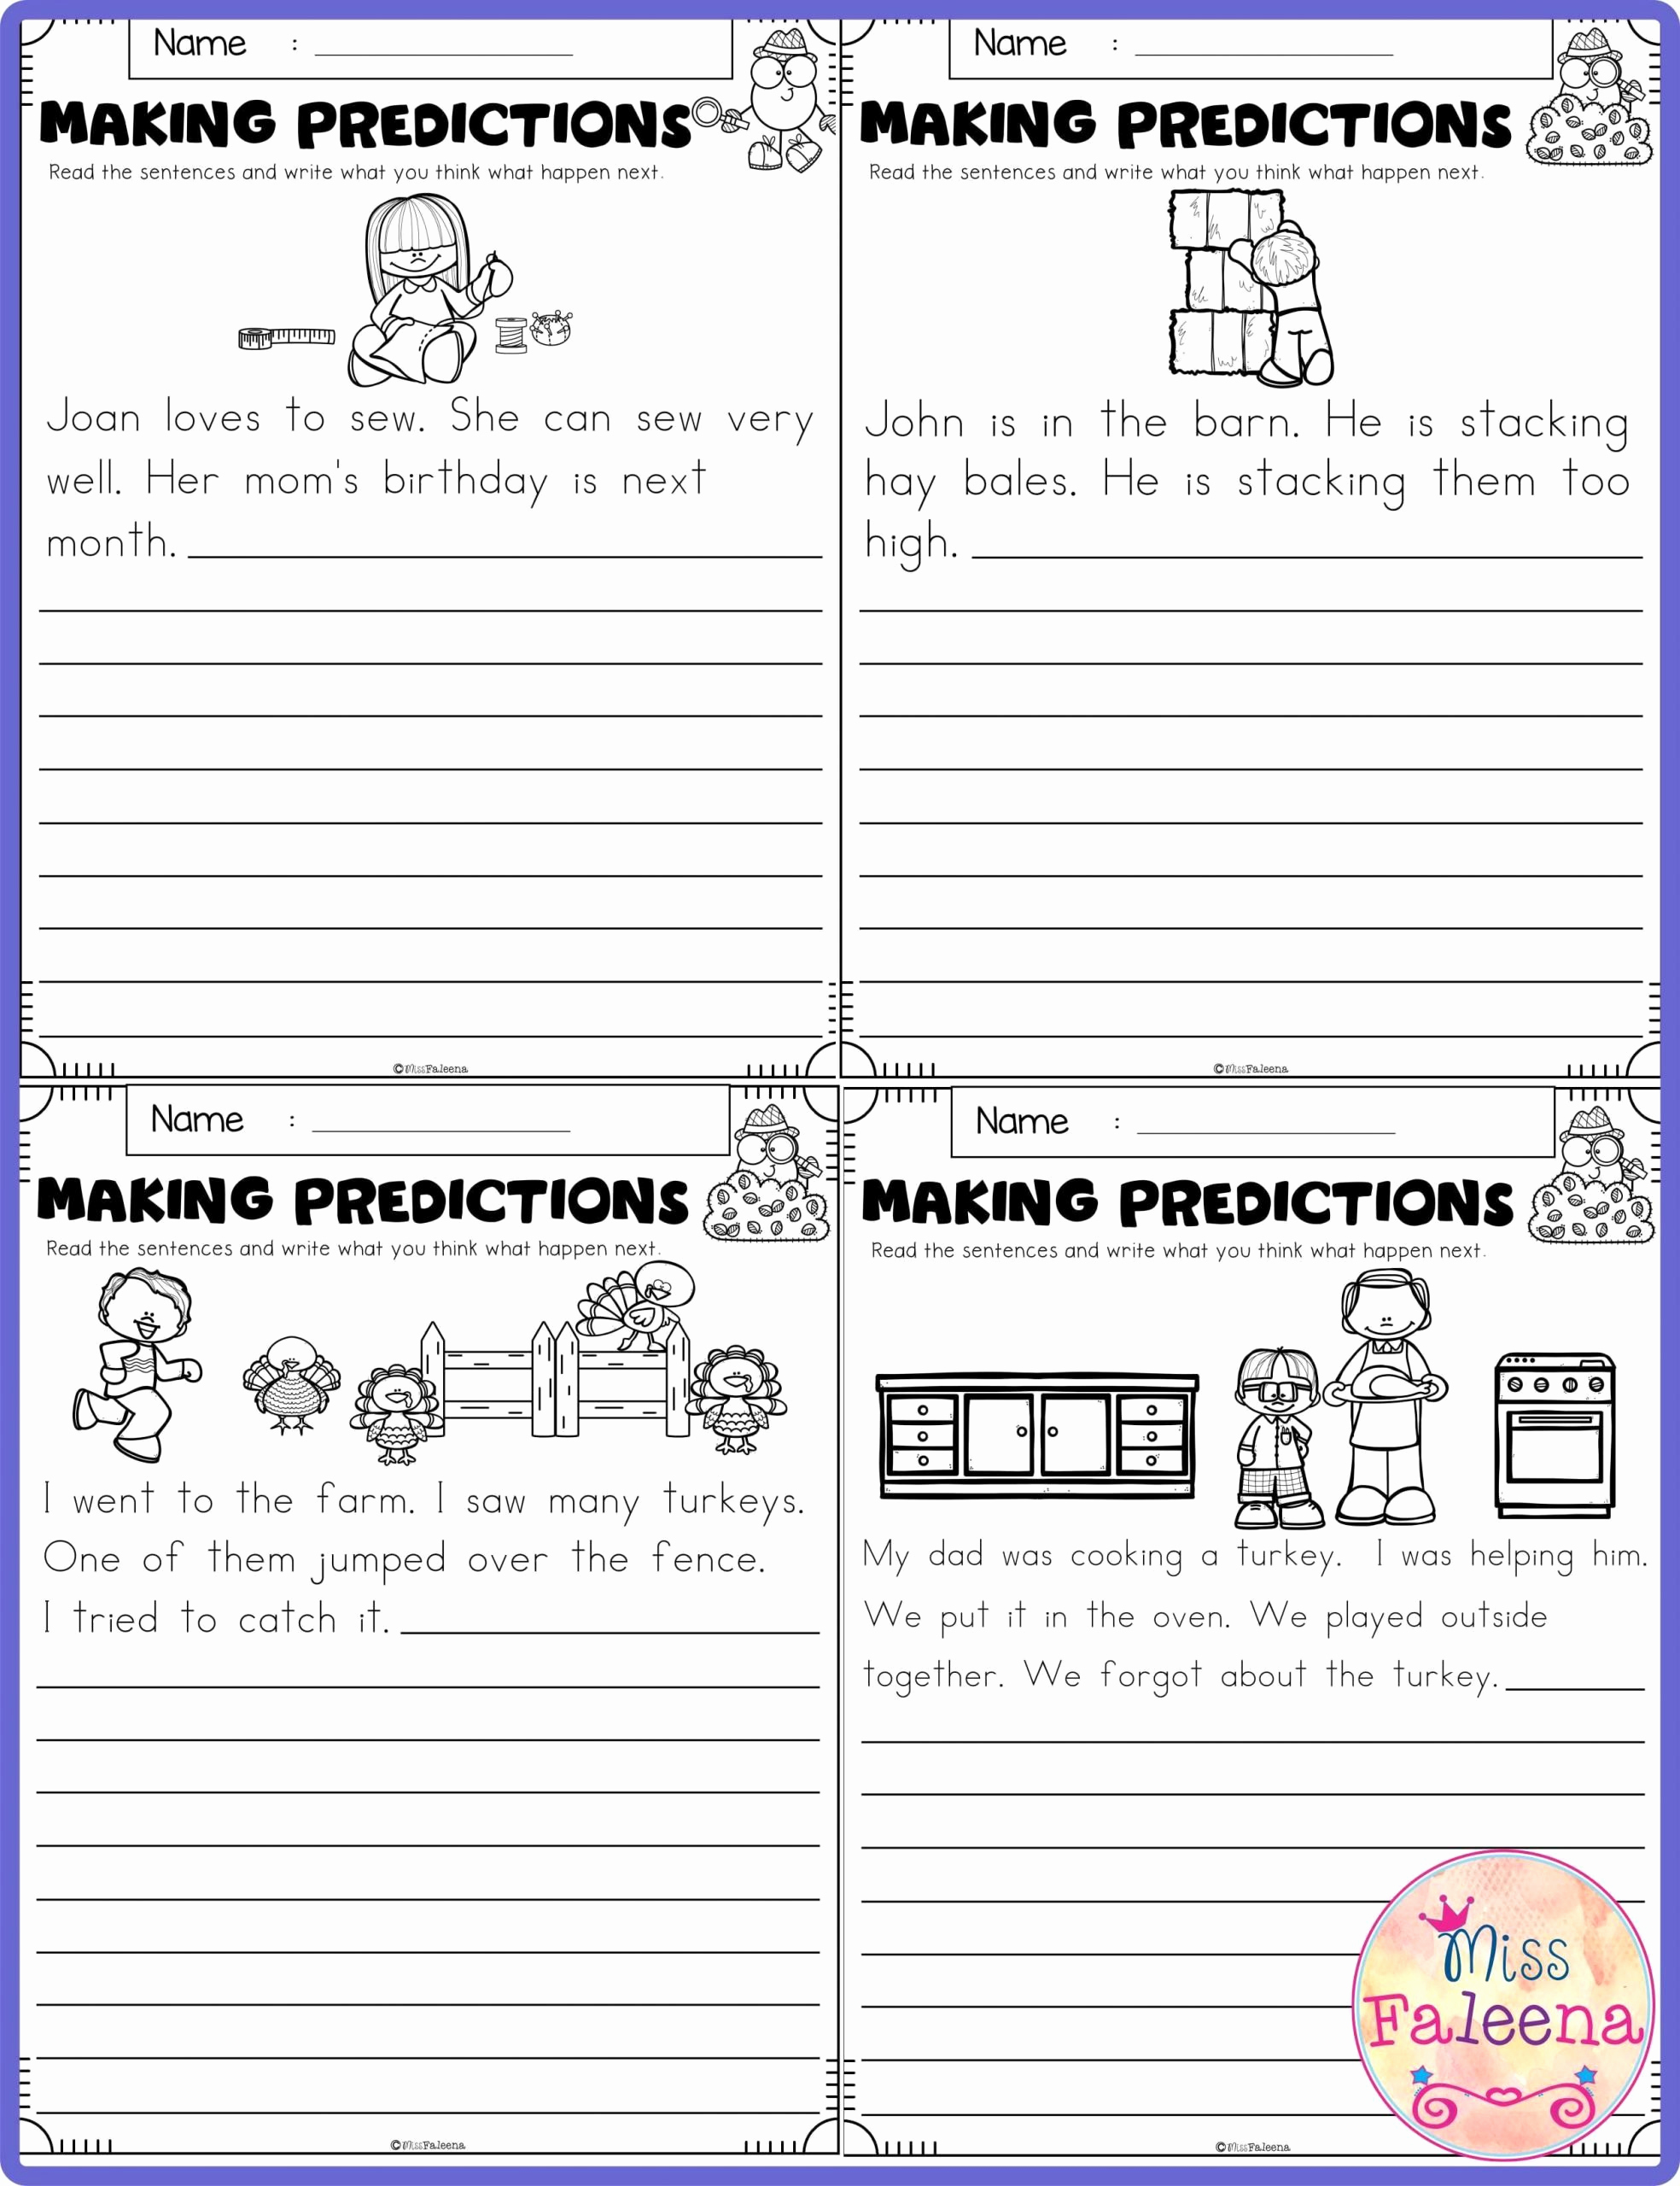 Making Predictions Worksheets 2nd Grade Elegant 20 Prediction Worksheet 2nd Grade